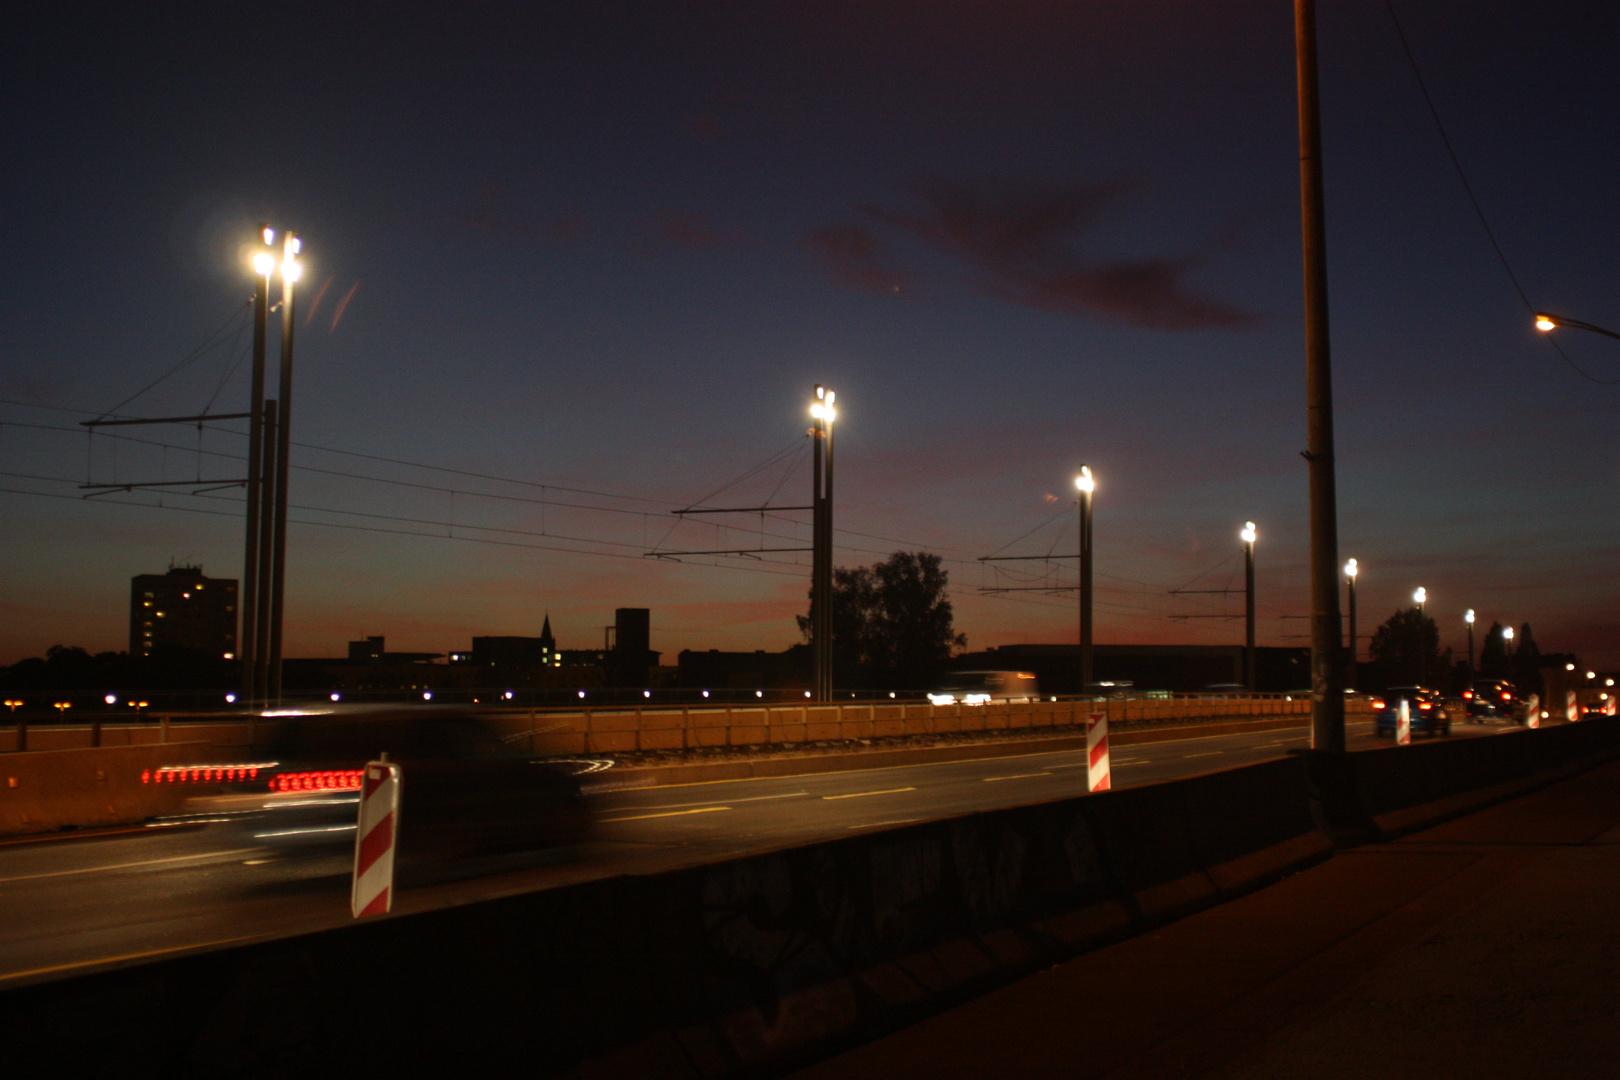 Humboldtbrücke, Potsdam